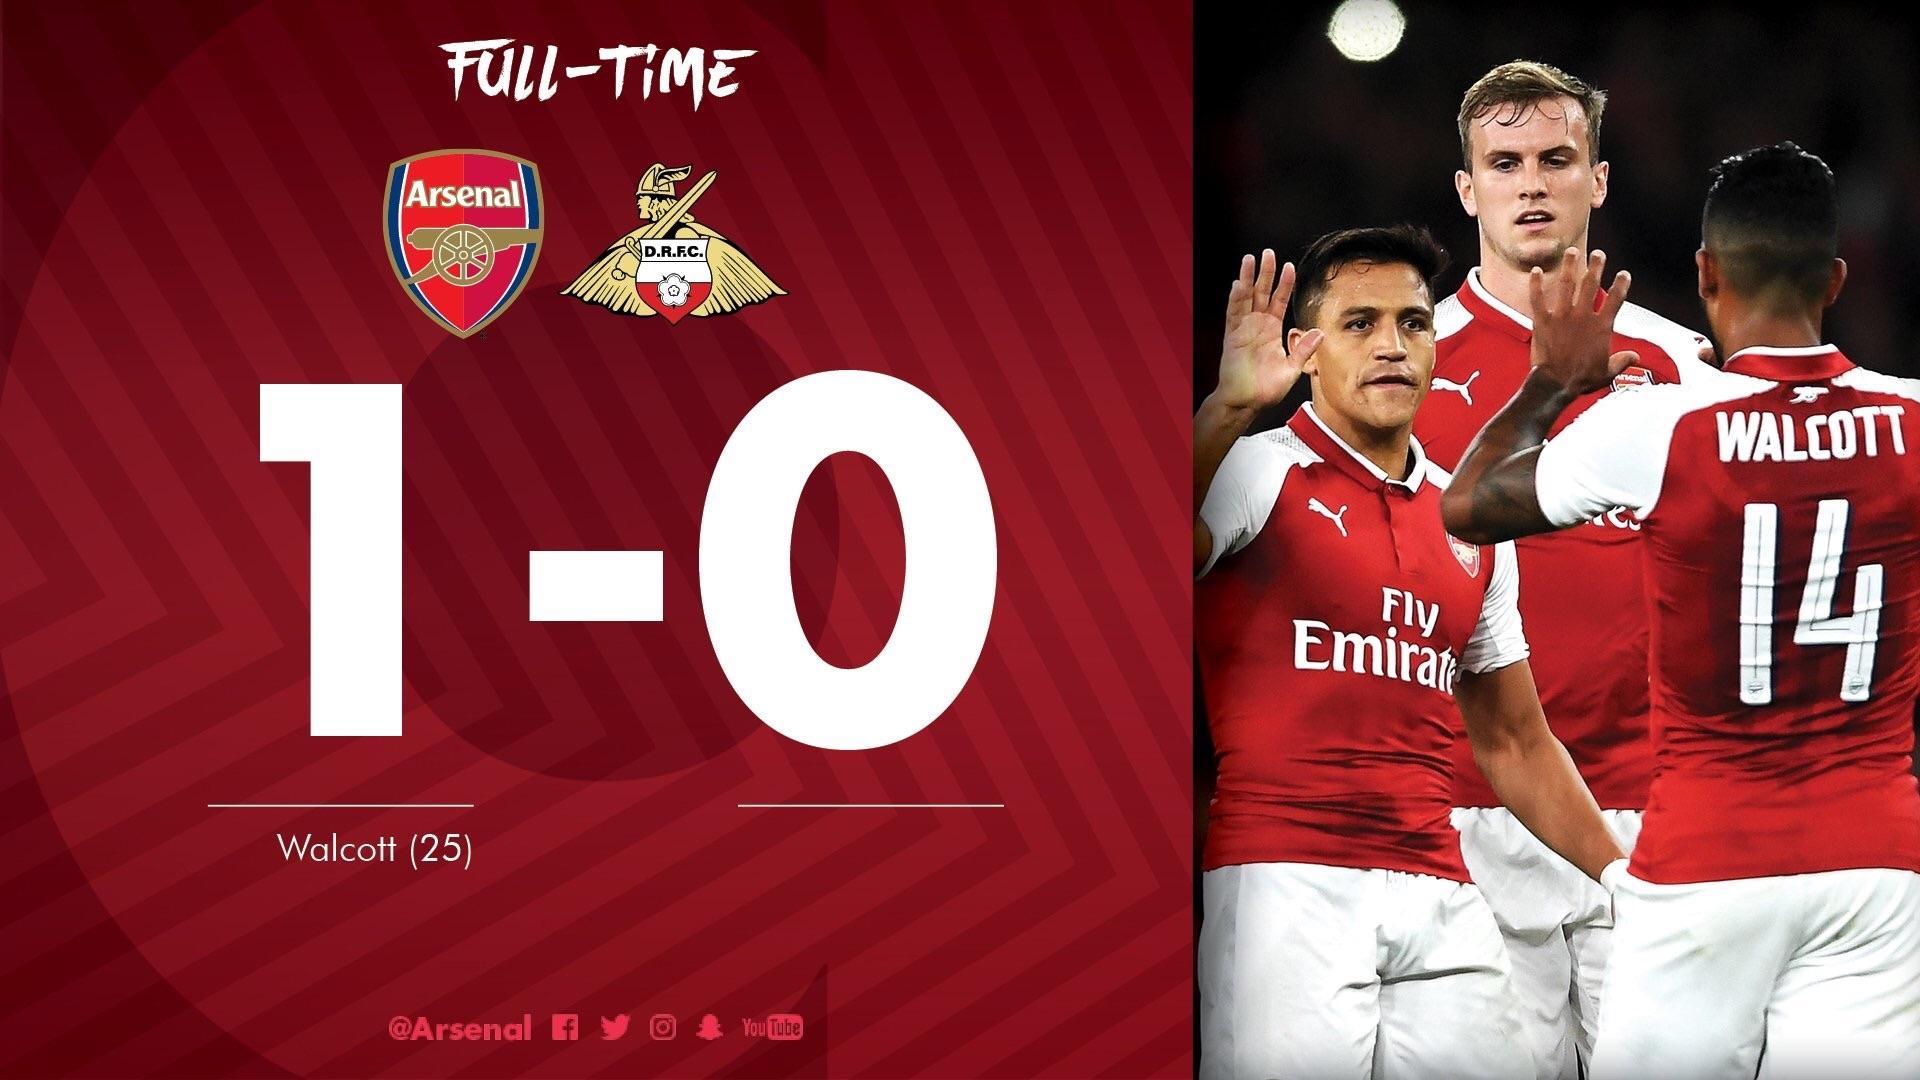 f:id:ArsenalRamsey8:20170921174108j:image